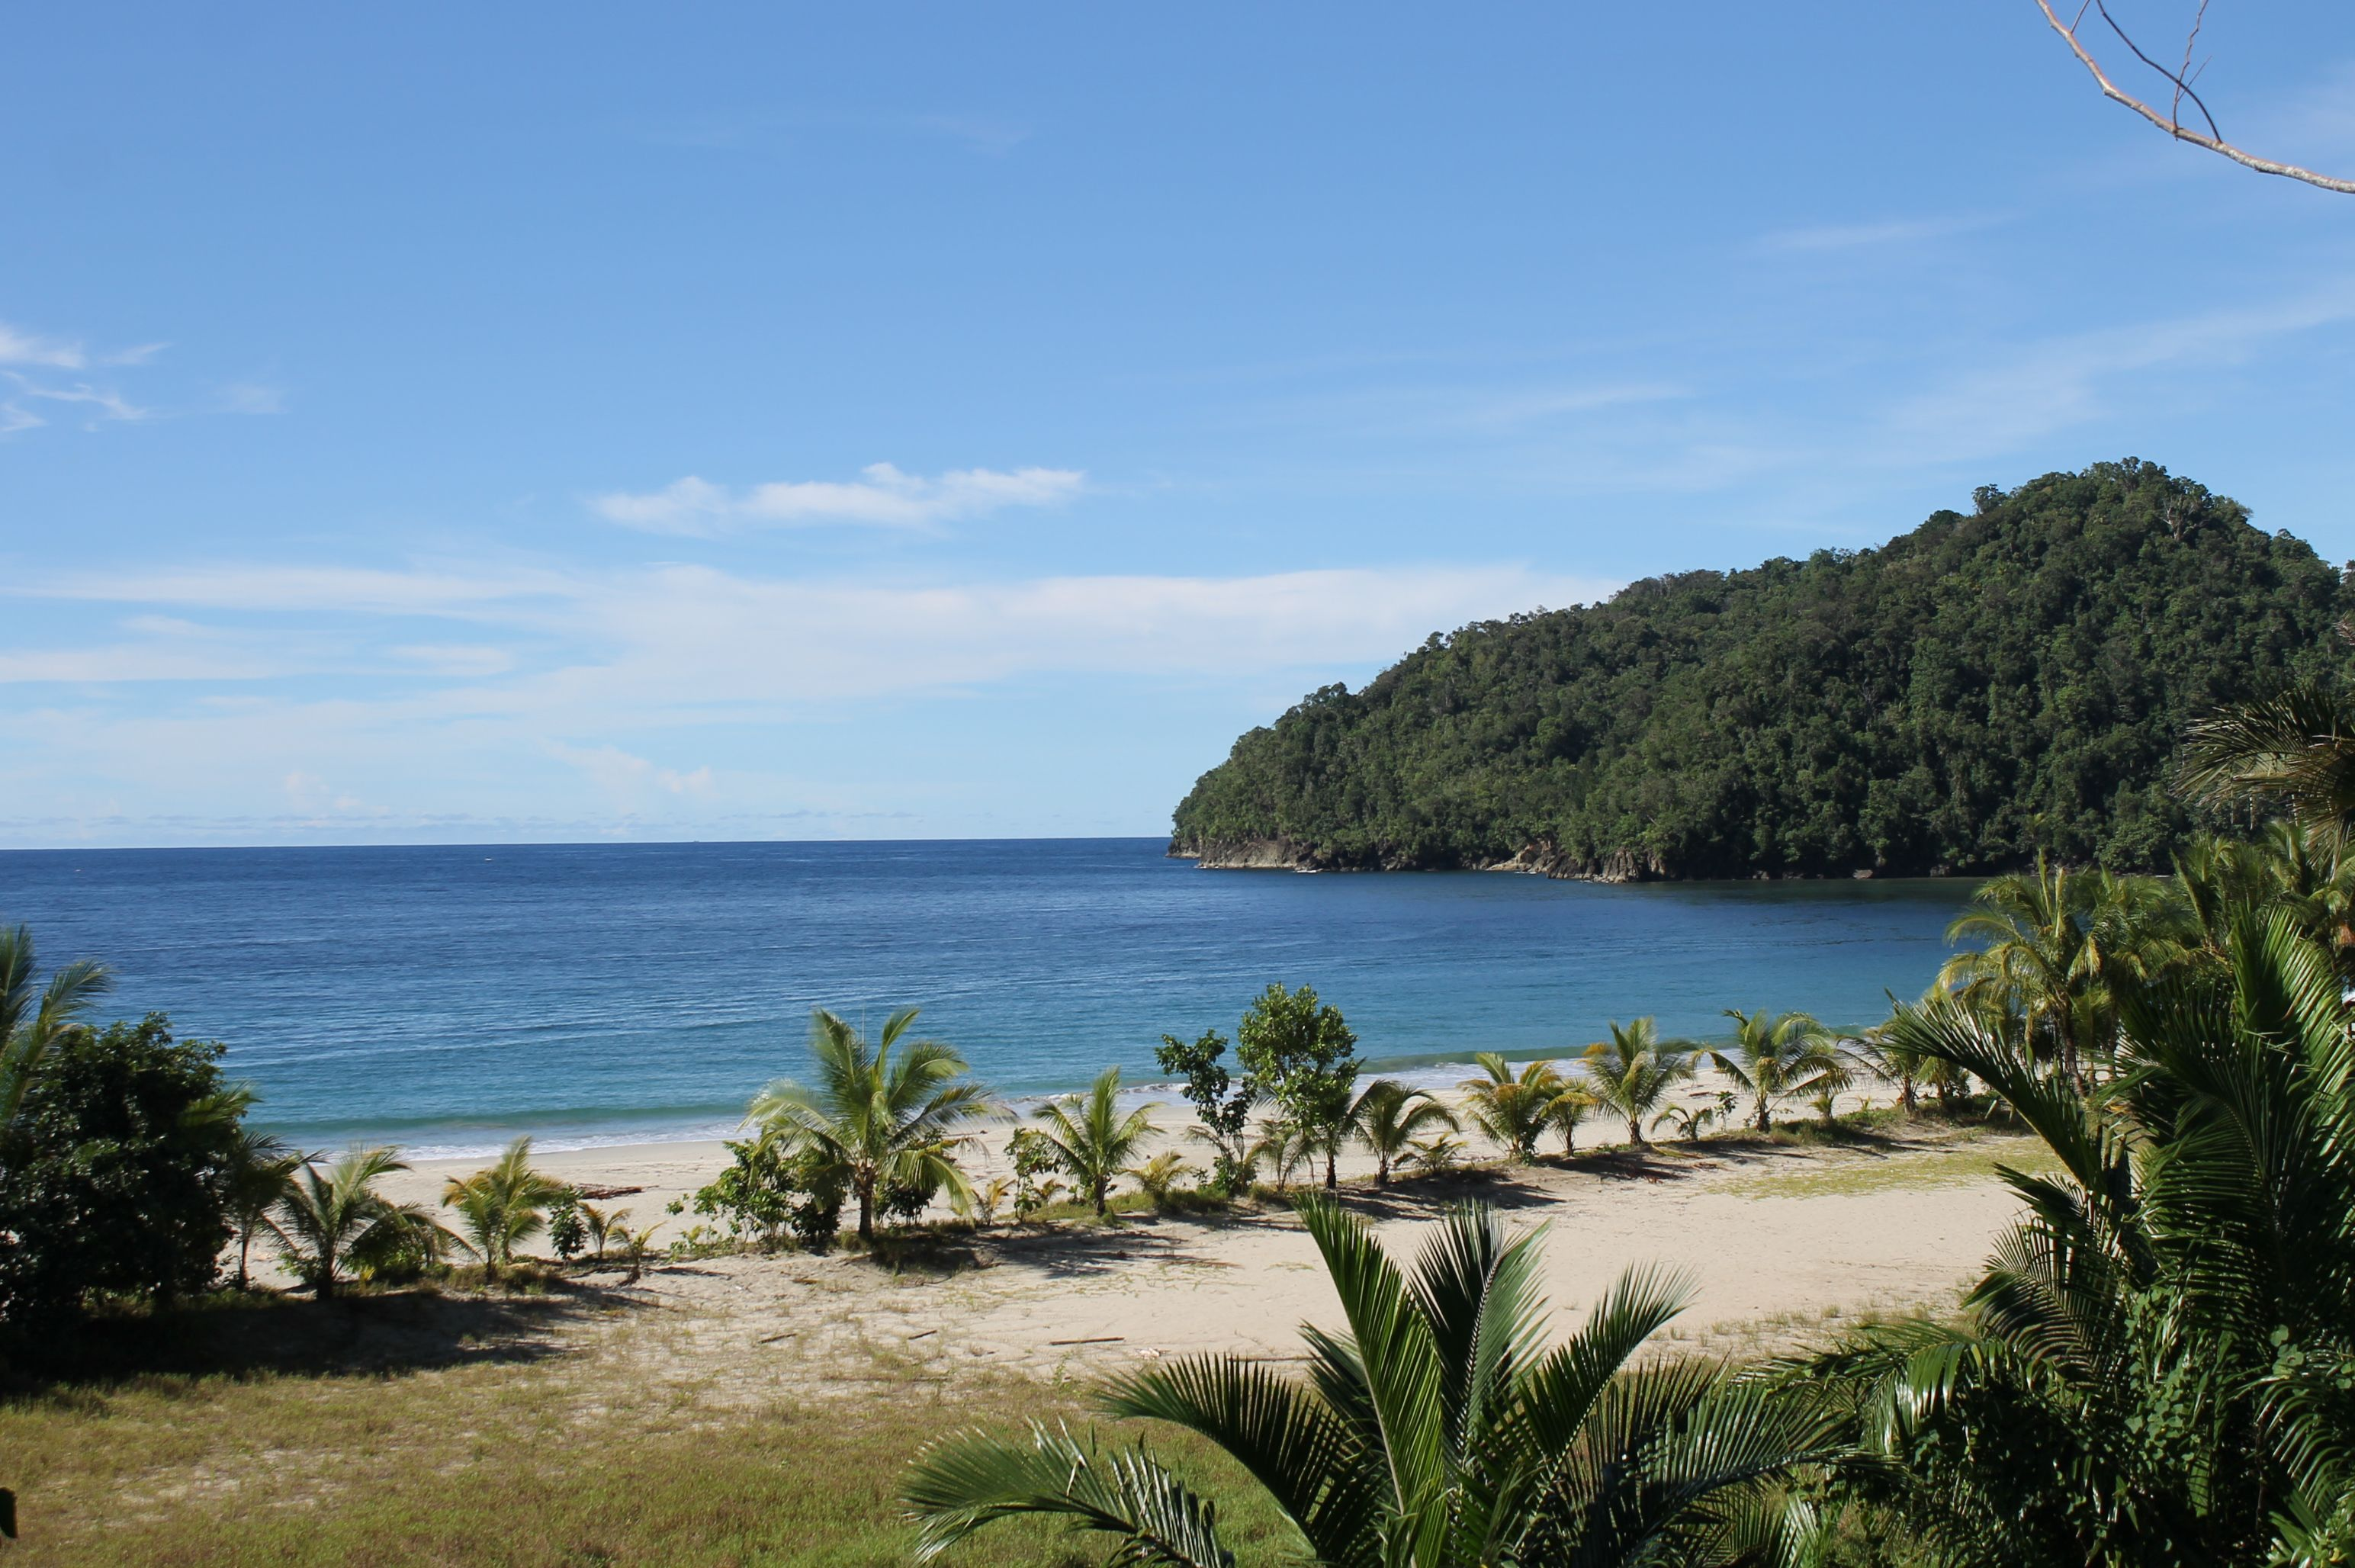 Pantai Bukisi Kampung Maruway Kabupaten Jayapura Papua Beach Pasir 6